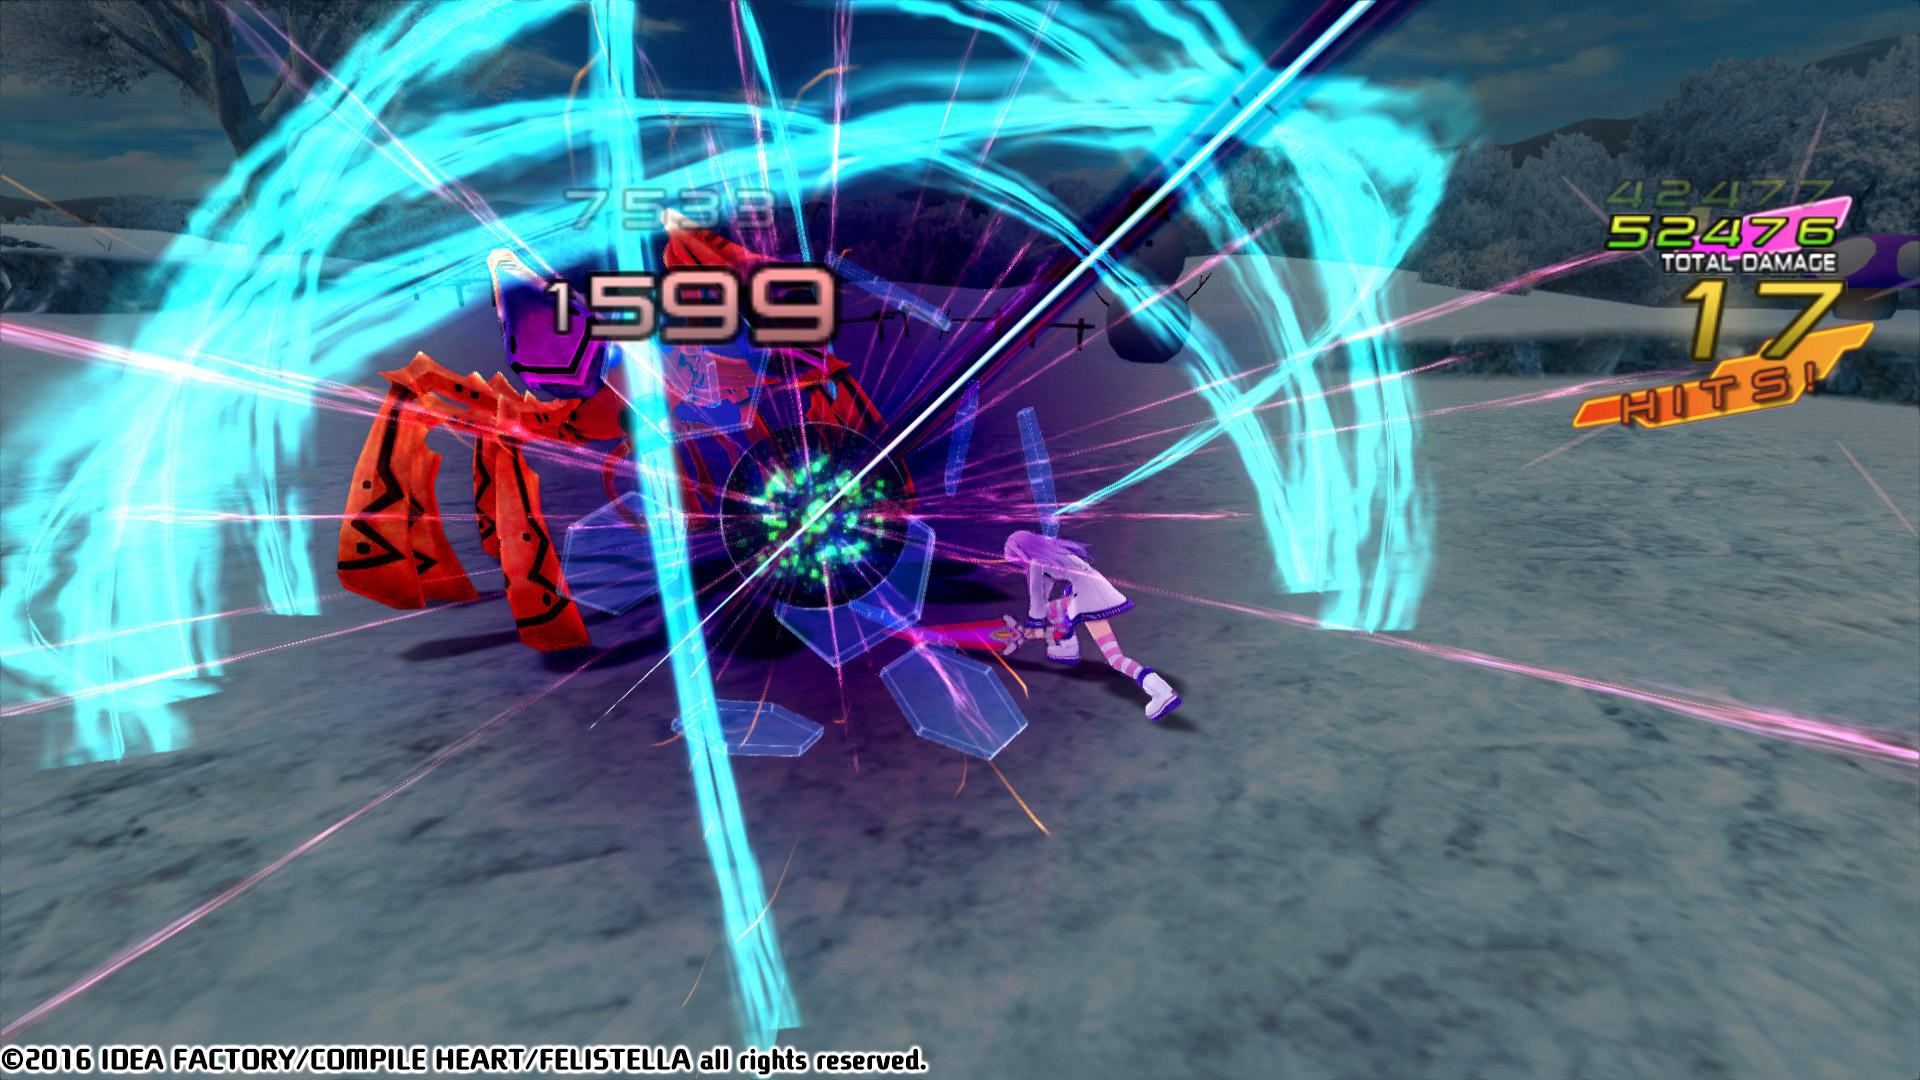 Hyperdimension Neptunia Re Birth1 Appid 282900 Steamdb